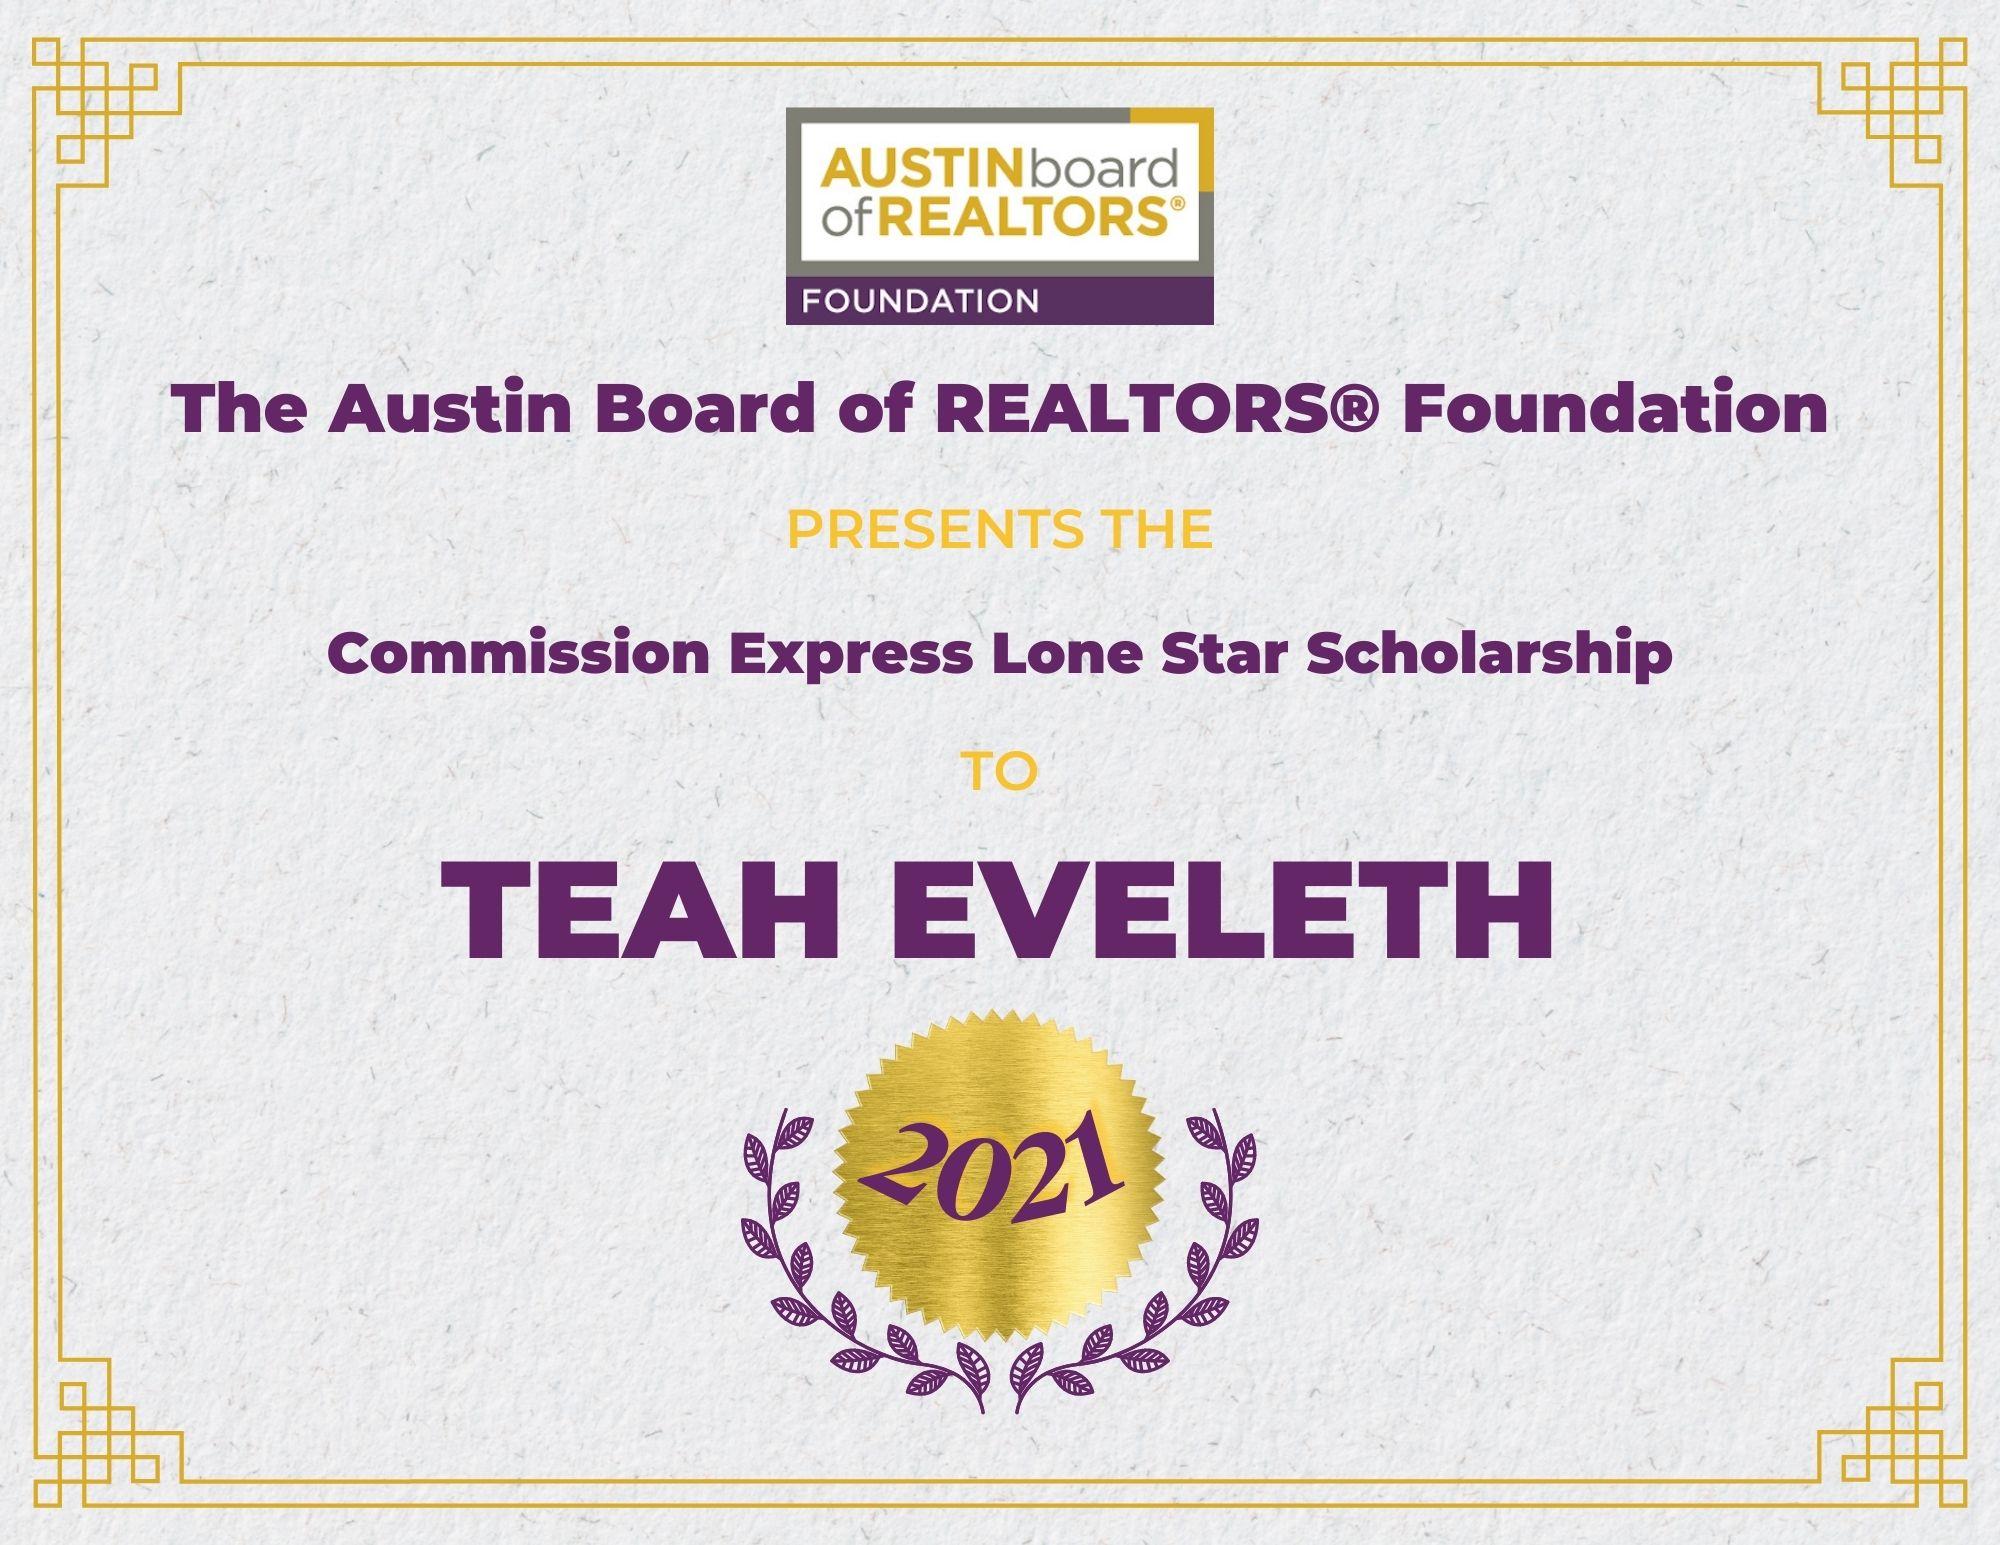 2021 Fou Scholarship Certificate Teaheveleth